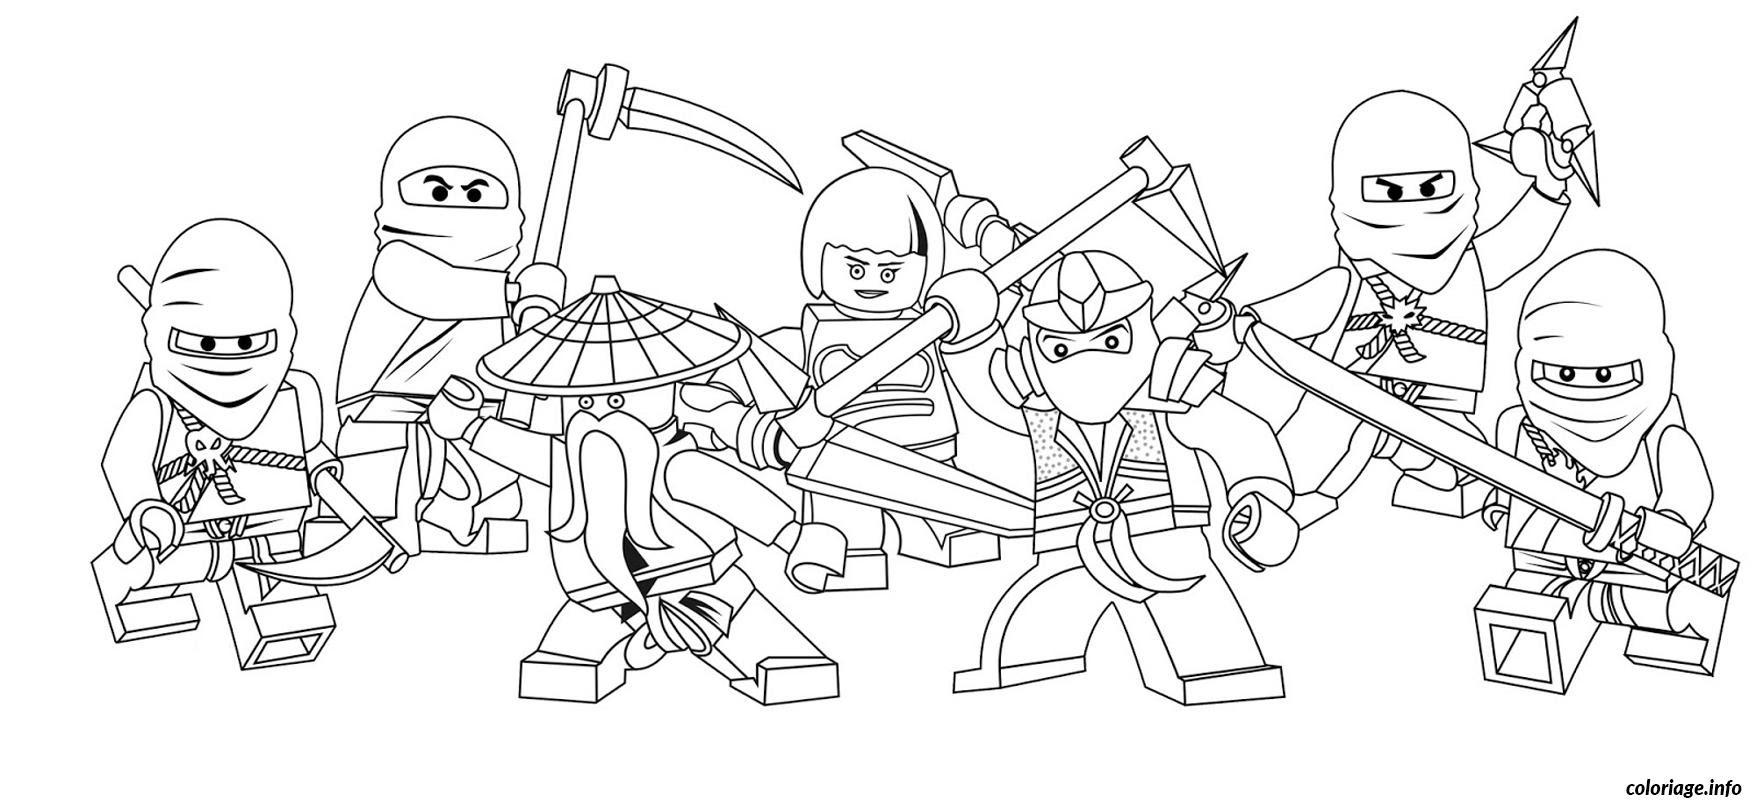 Coloriage Ninjago Equipe plete Lego Dessin Dessin  Imprimer